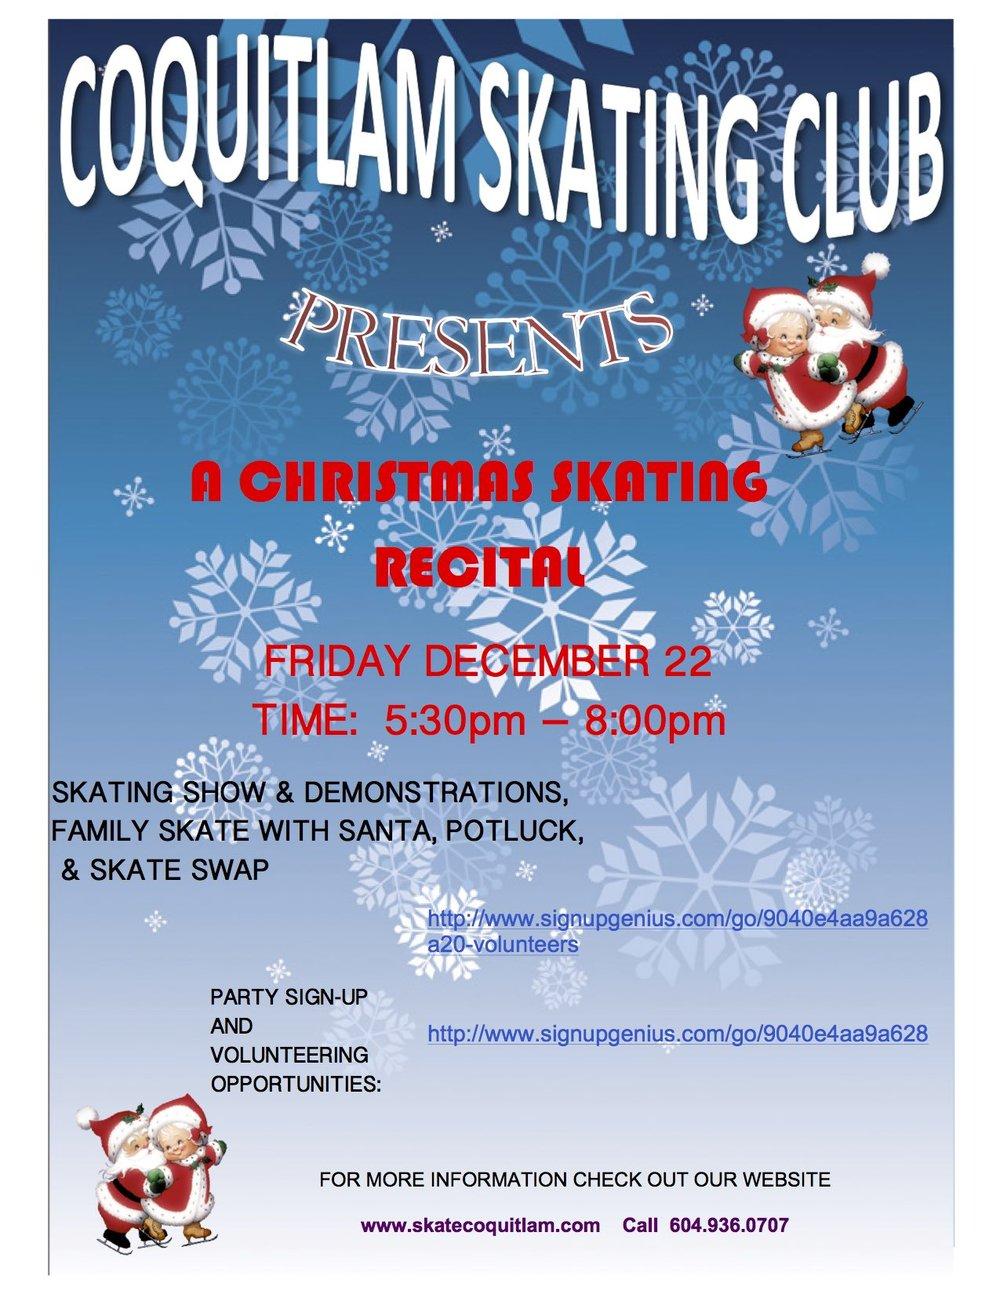 CSC Christmas Recital Poster 2017 (1).jpg